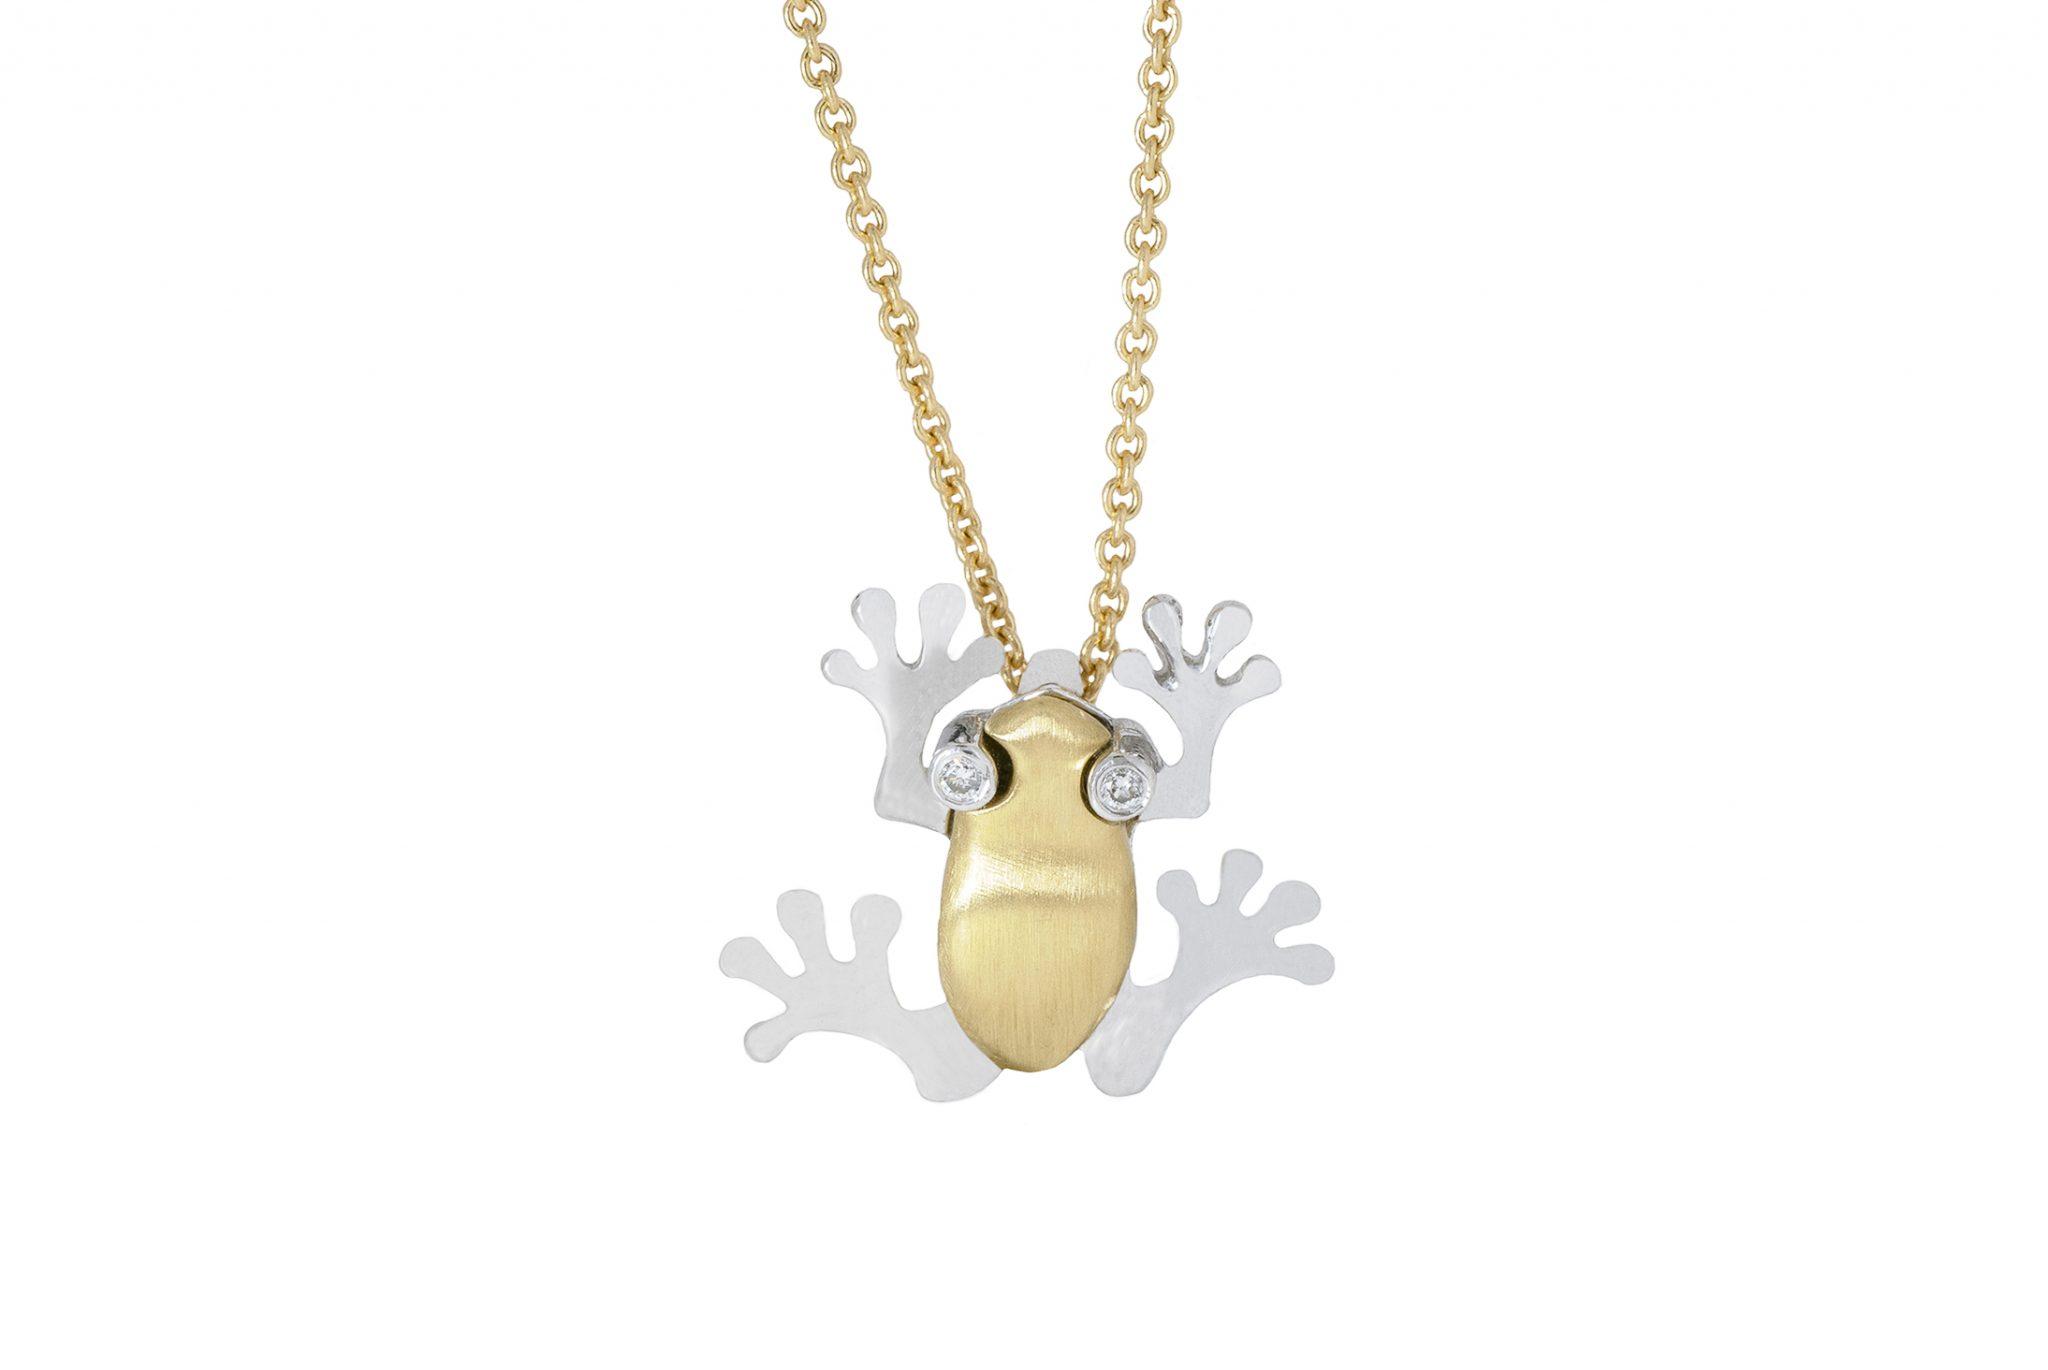 diamond frog necklace | B20729